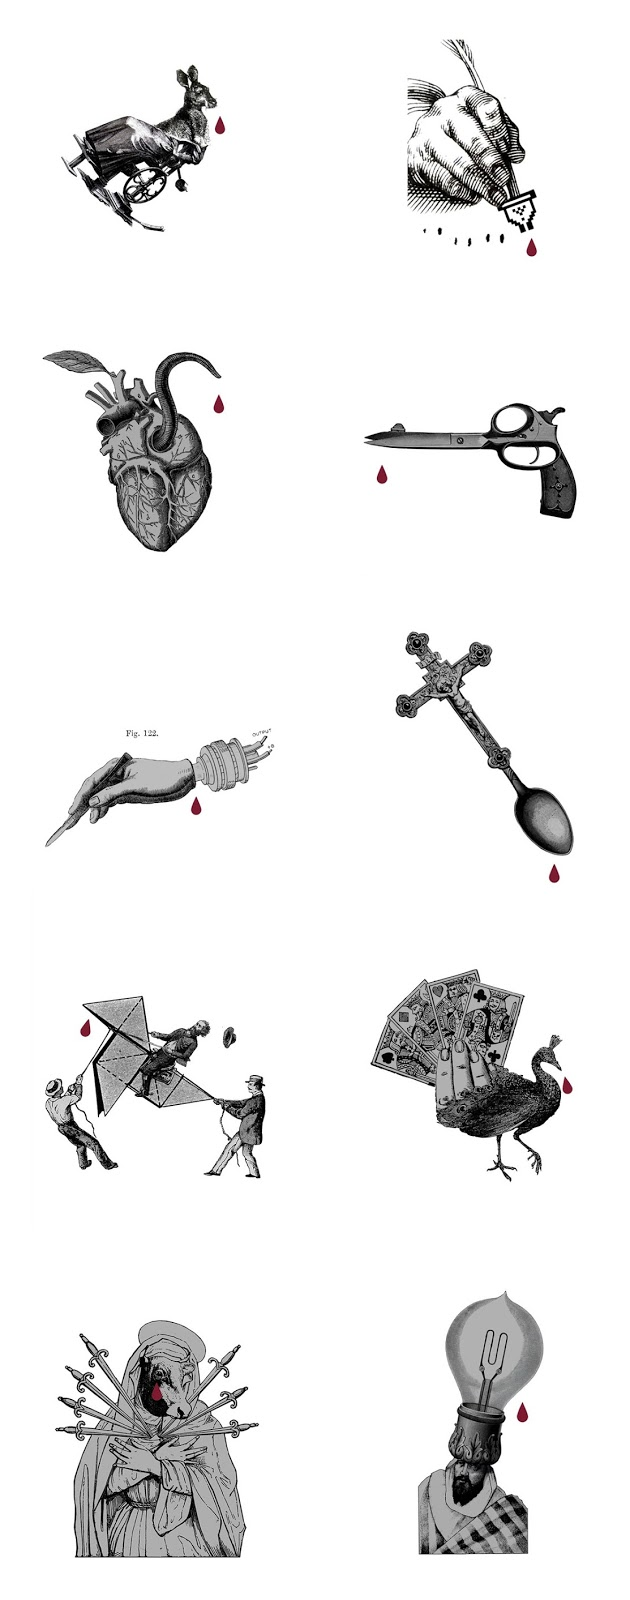 a primera sangre_collage-poesia visual_collage poetico_Valencia_ilustrador_Gustavo_Solana_cutandpaste_collagedigital_virgen_tijeras_vega_tordesillas_terrorist